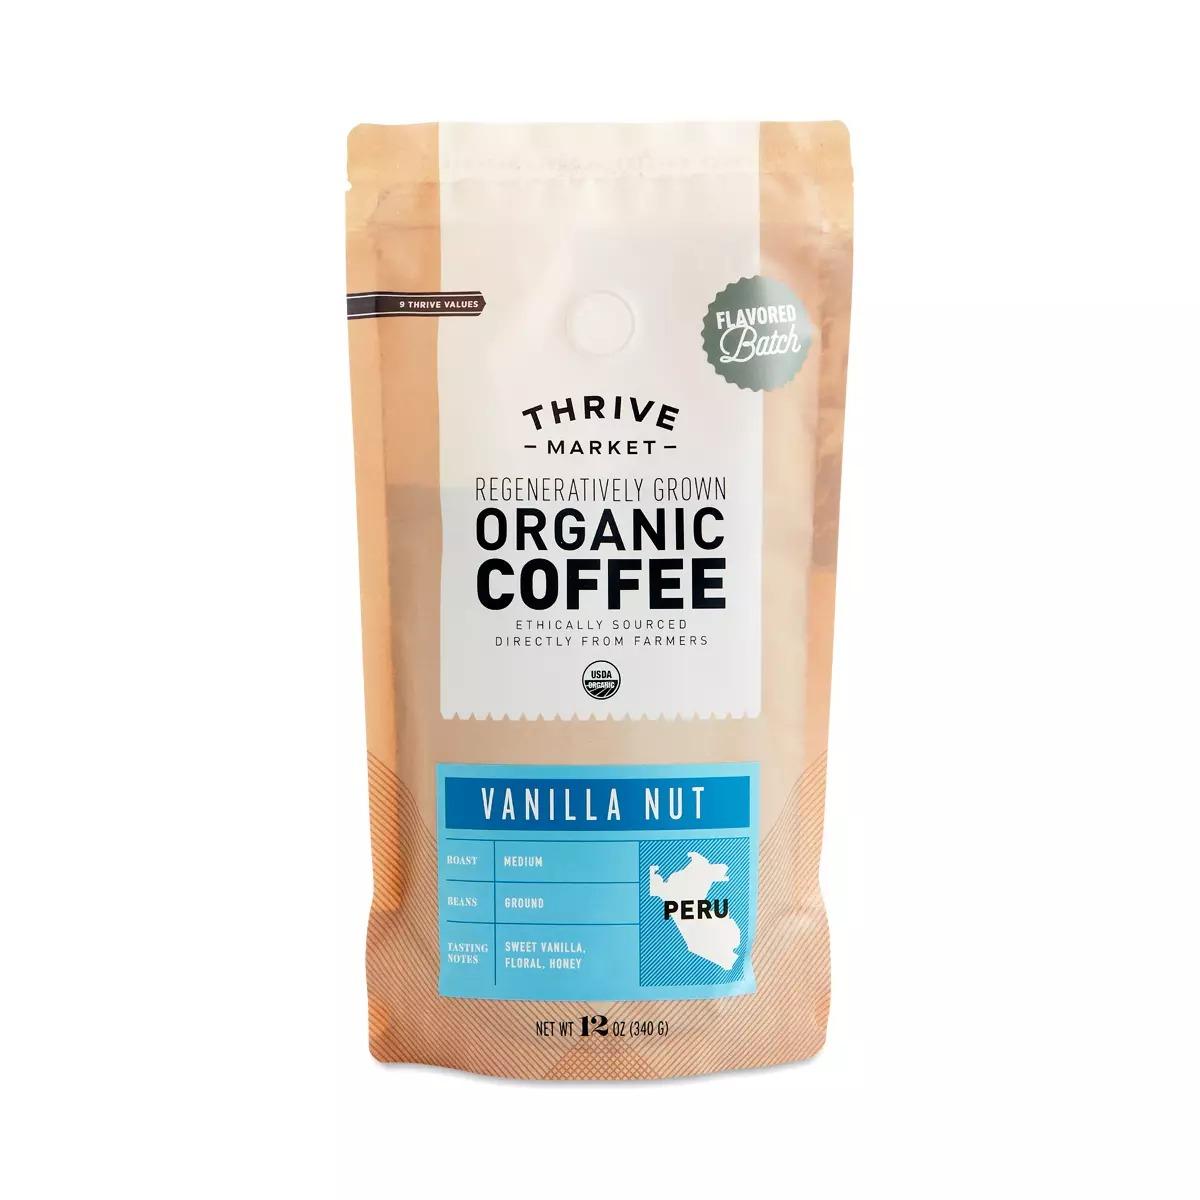 Thrive Market Organic Vanilla Nut Coffee